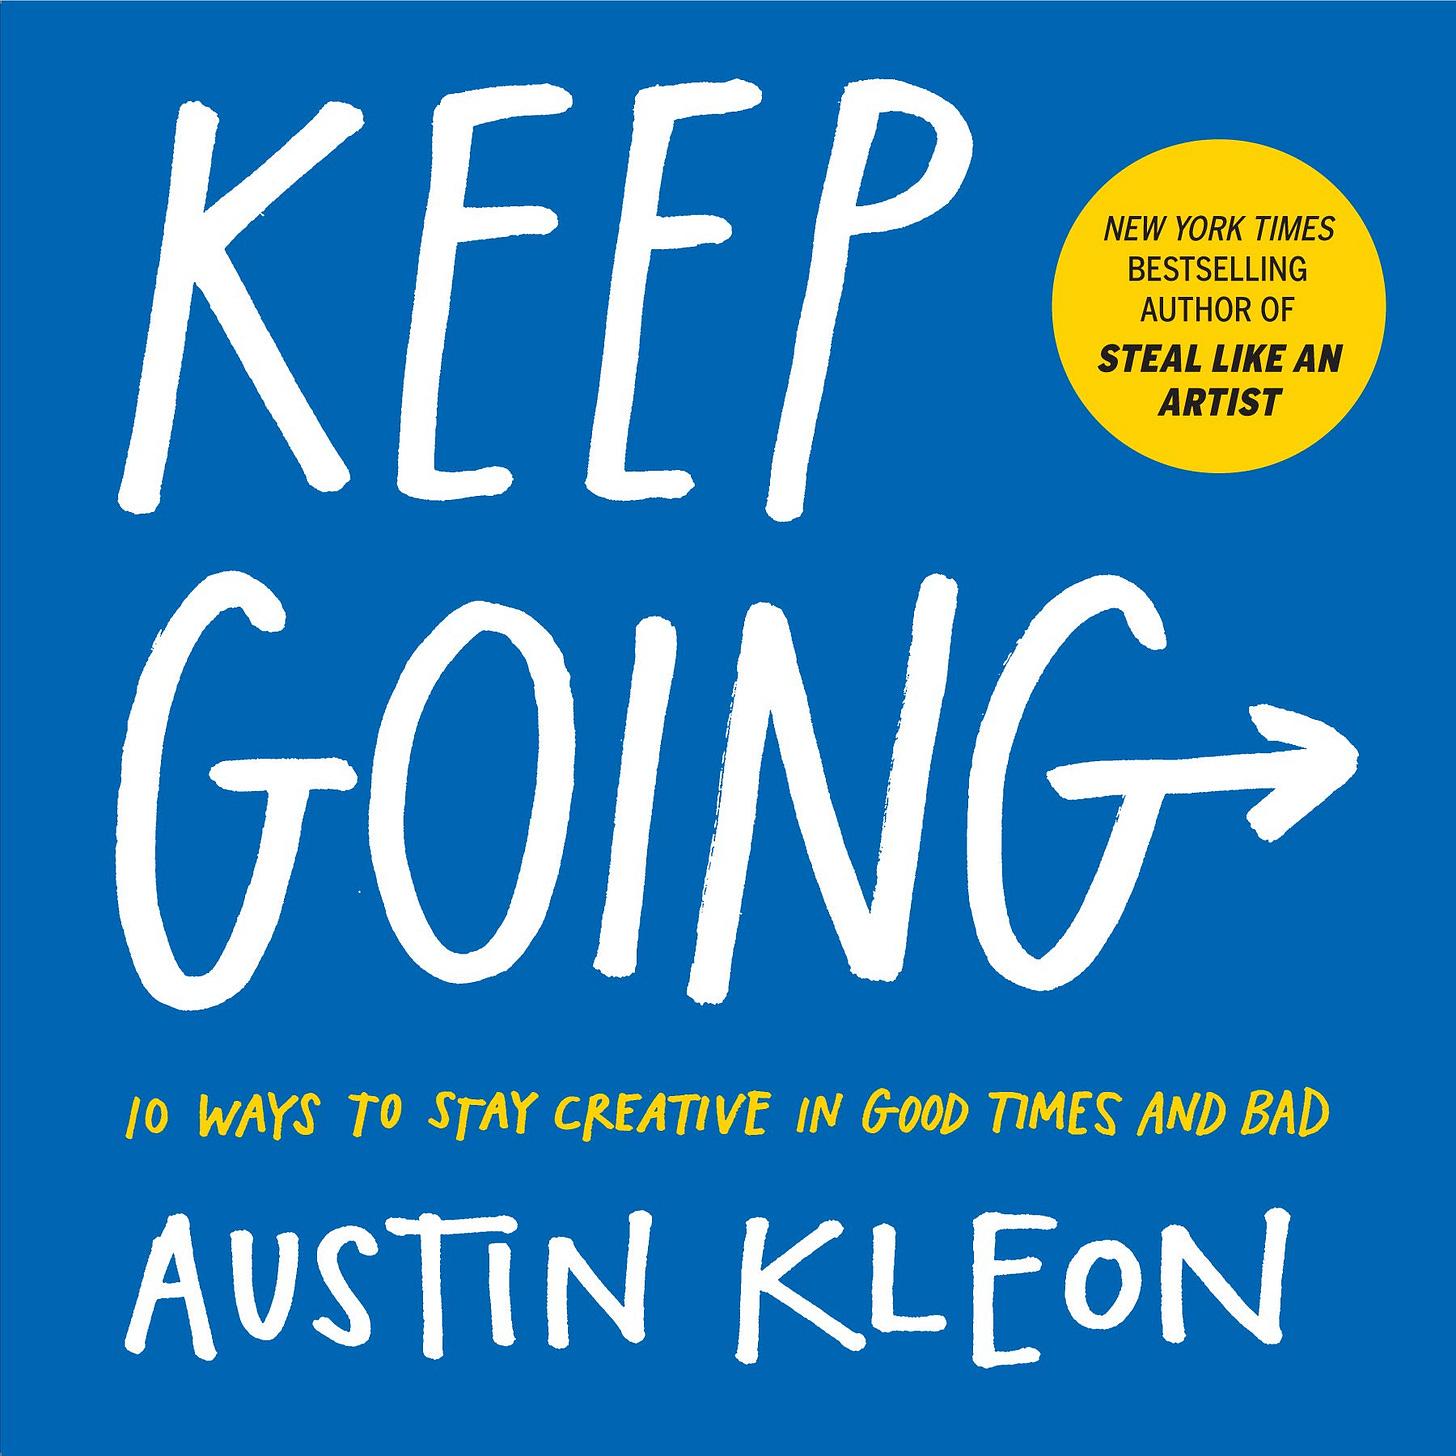 Keep Going: 10 Ways To Stay Creative In Good Times And Bad (Austin Kleon) : Austin  Kleon: Amazon.co.uk: Books